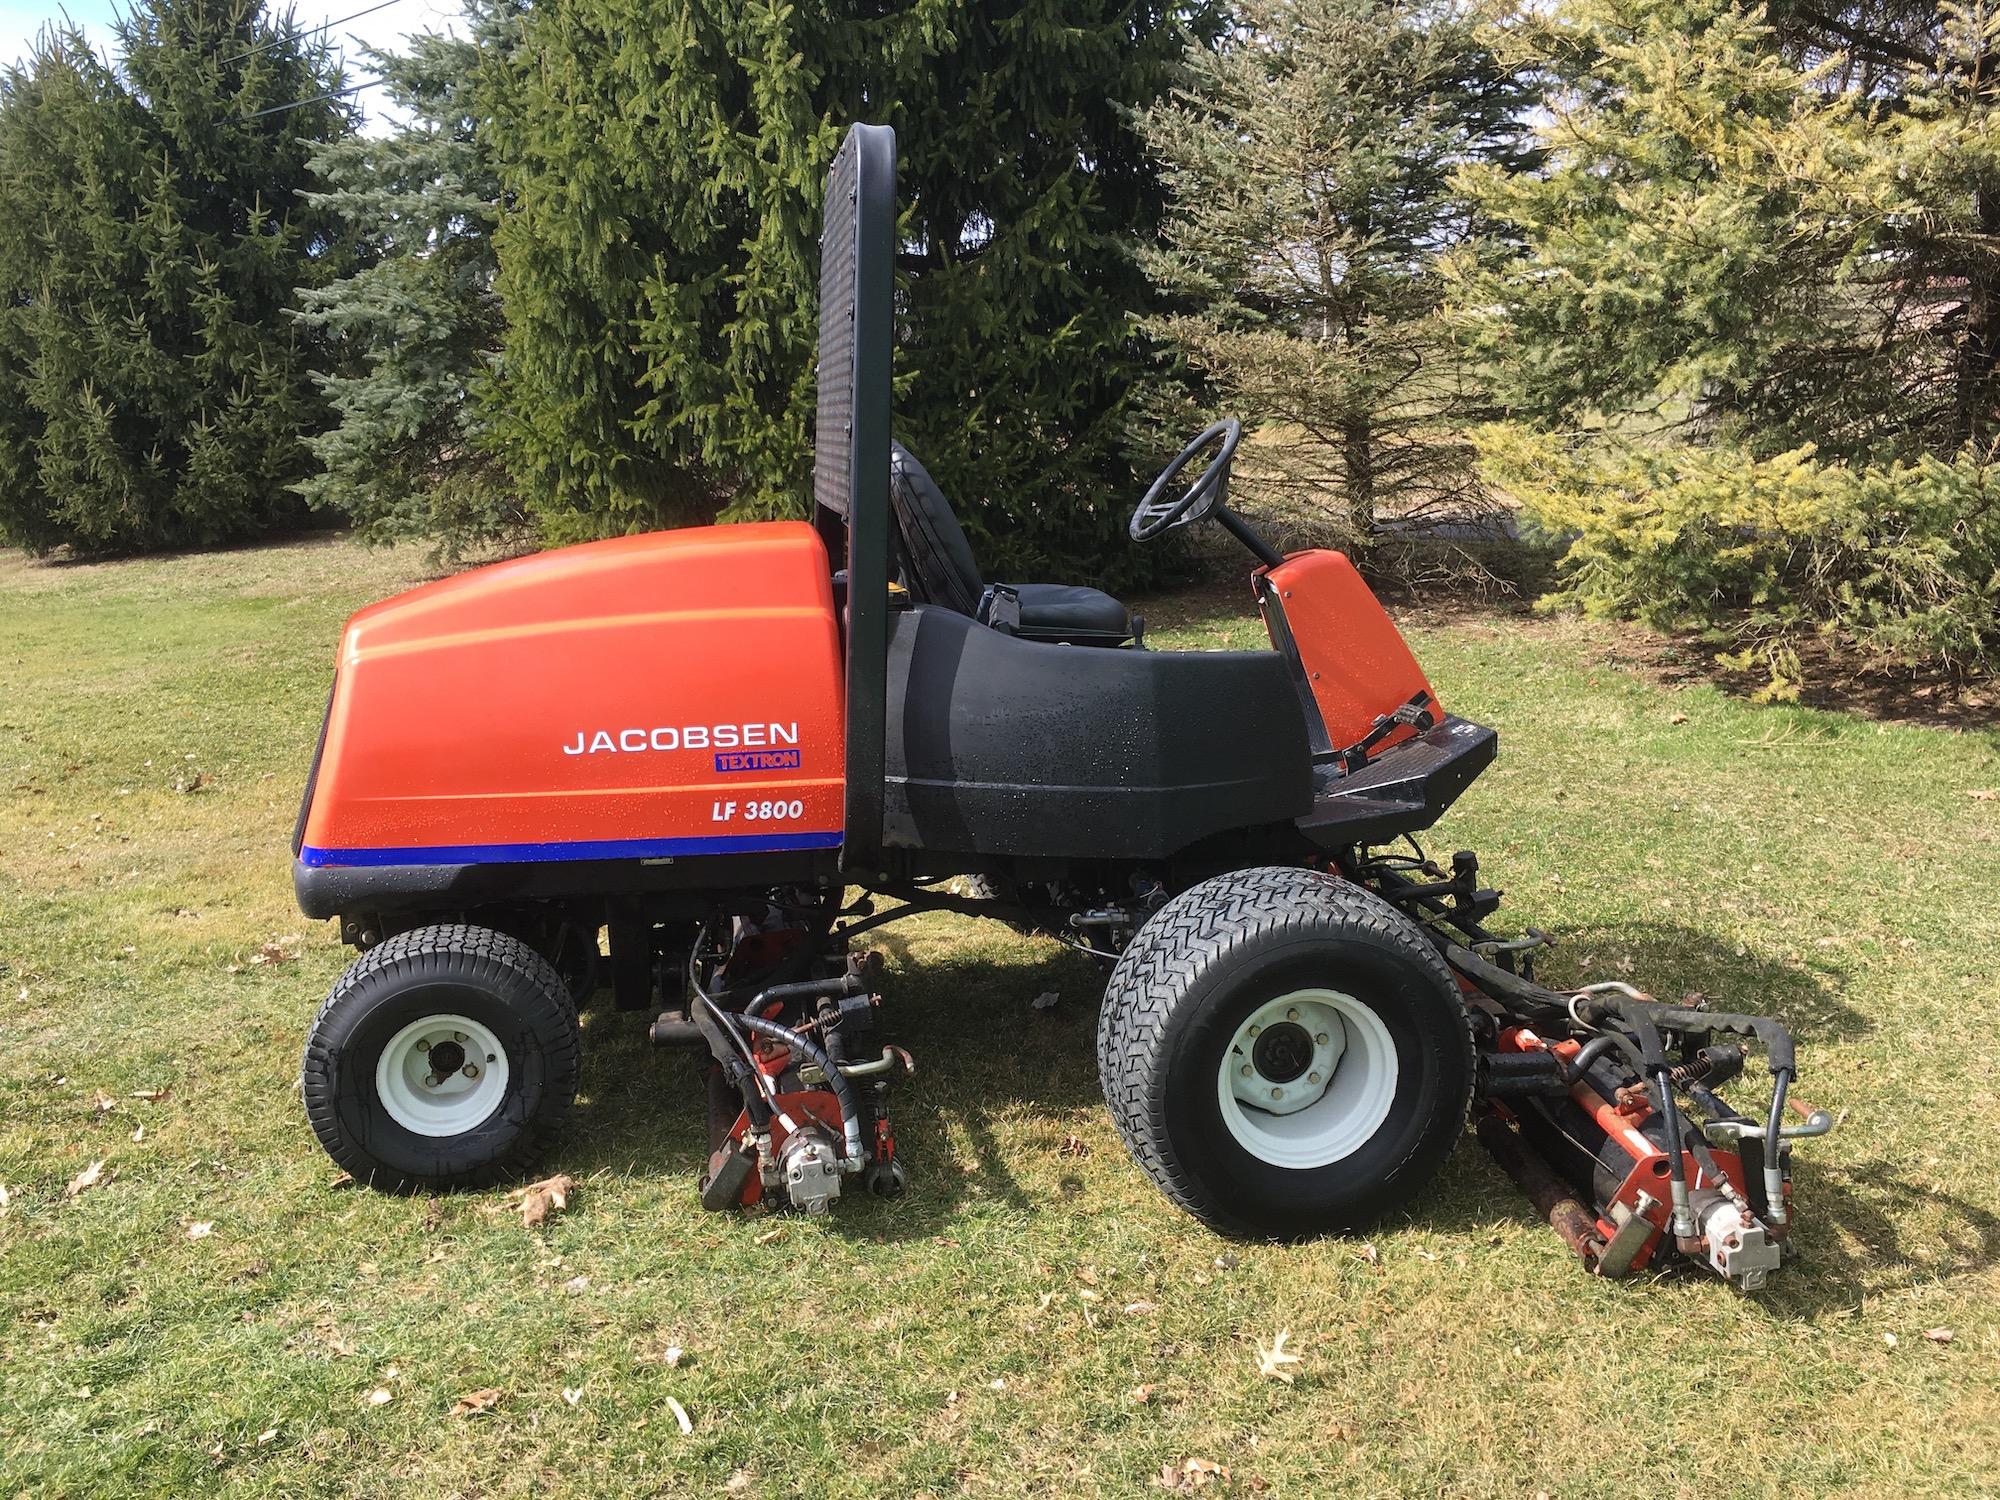 Jacobsen-LF3800-FairwayMower-01